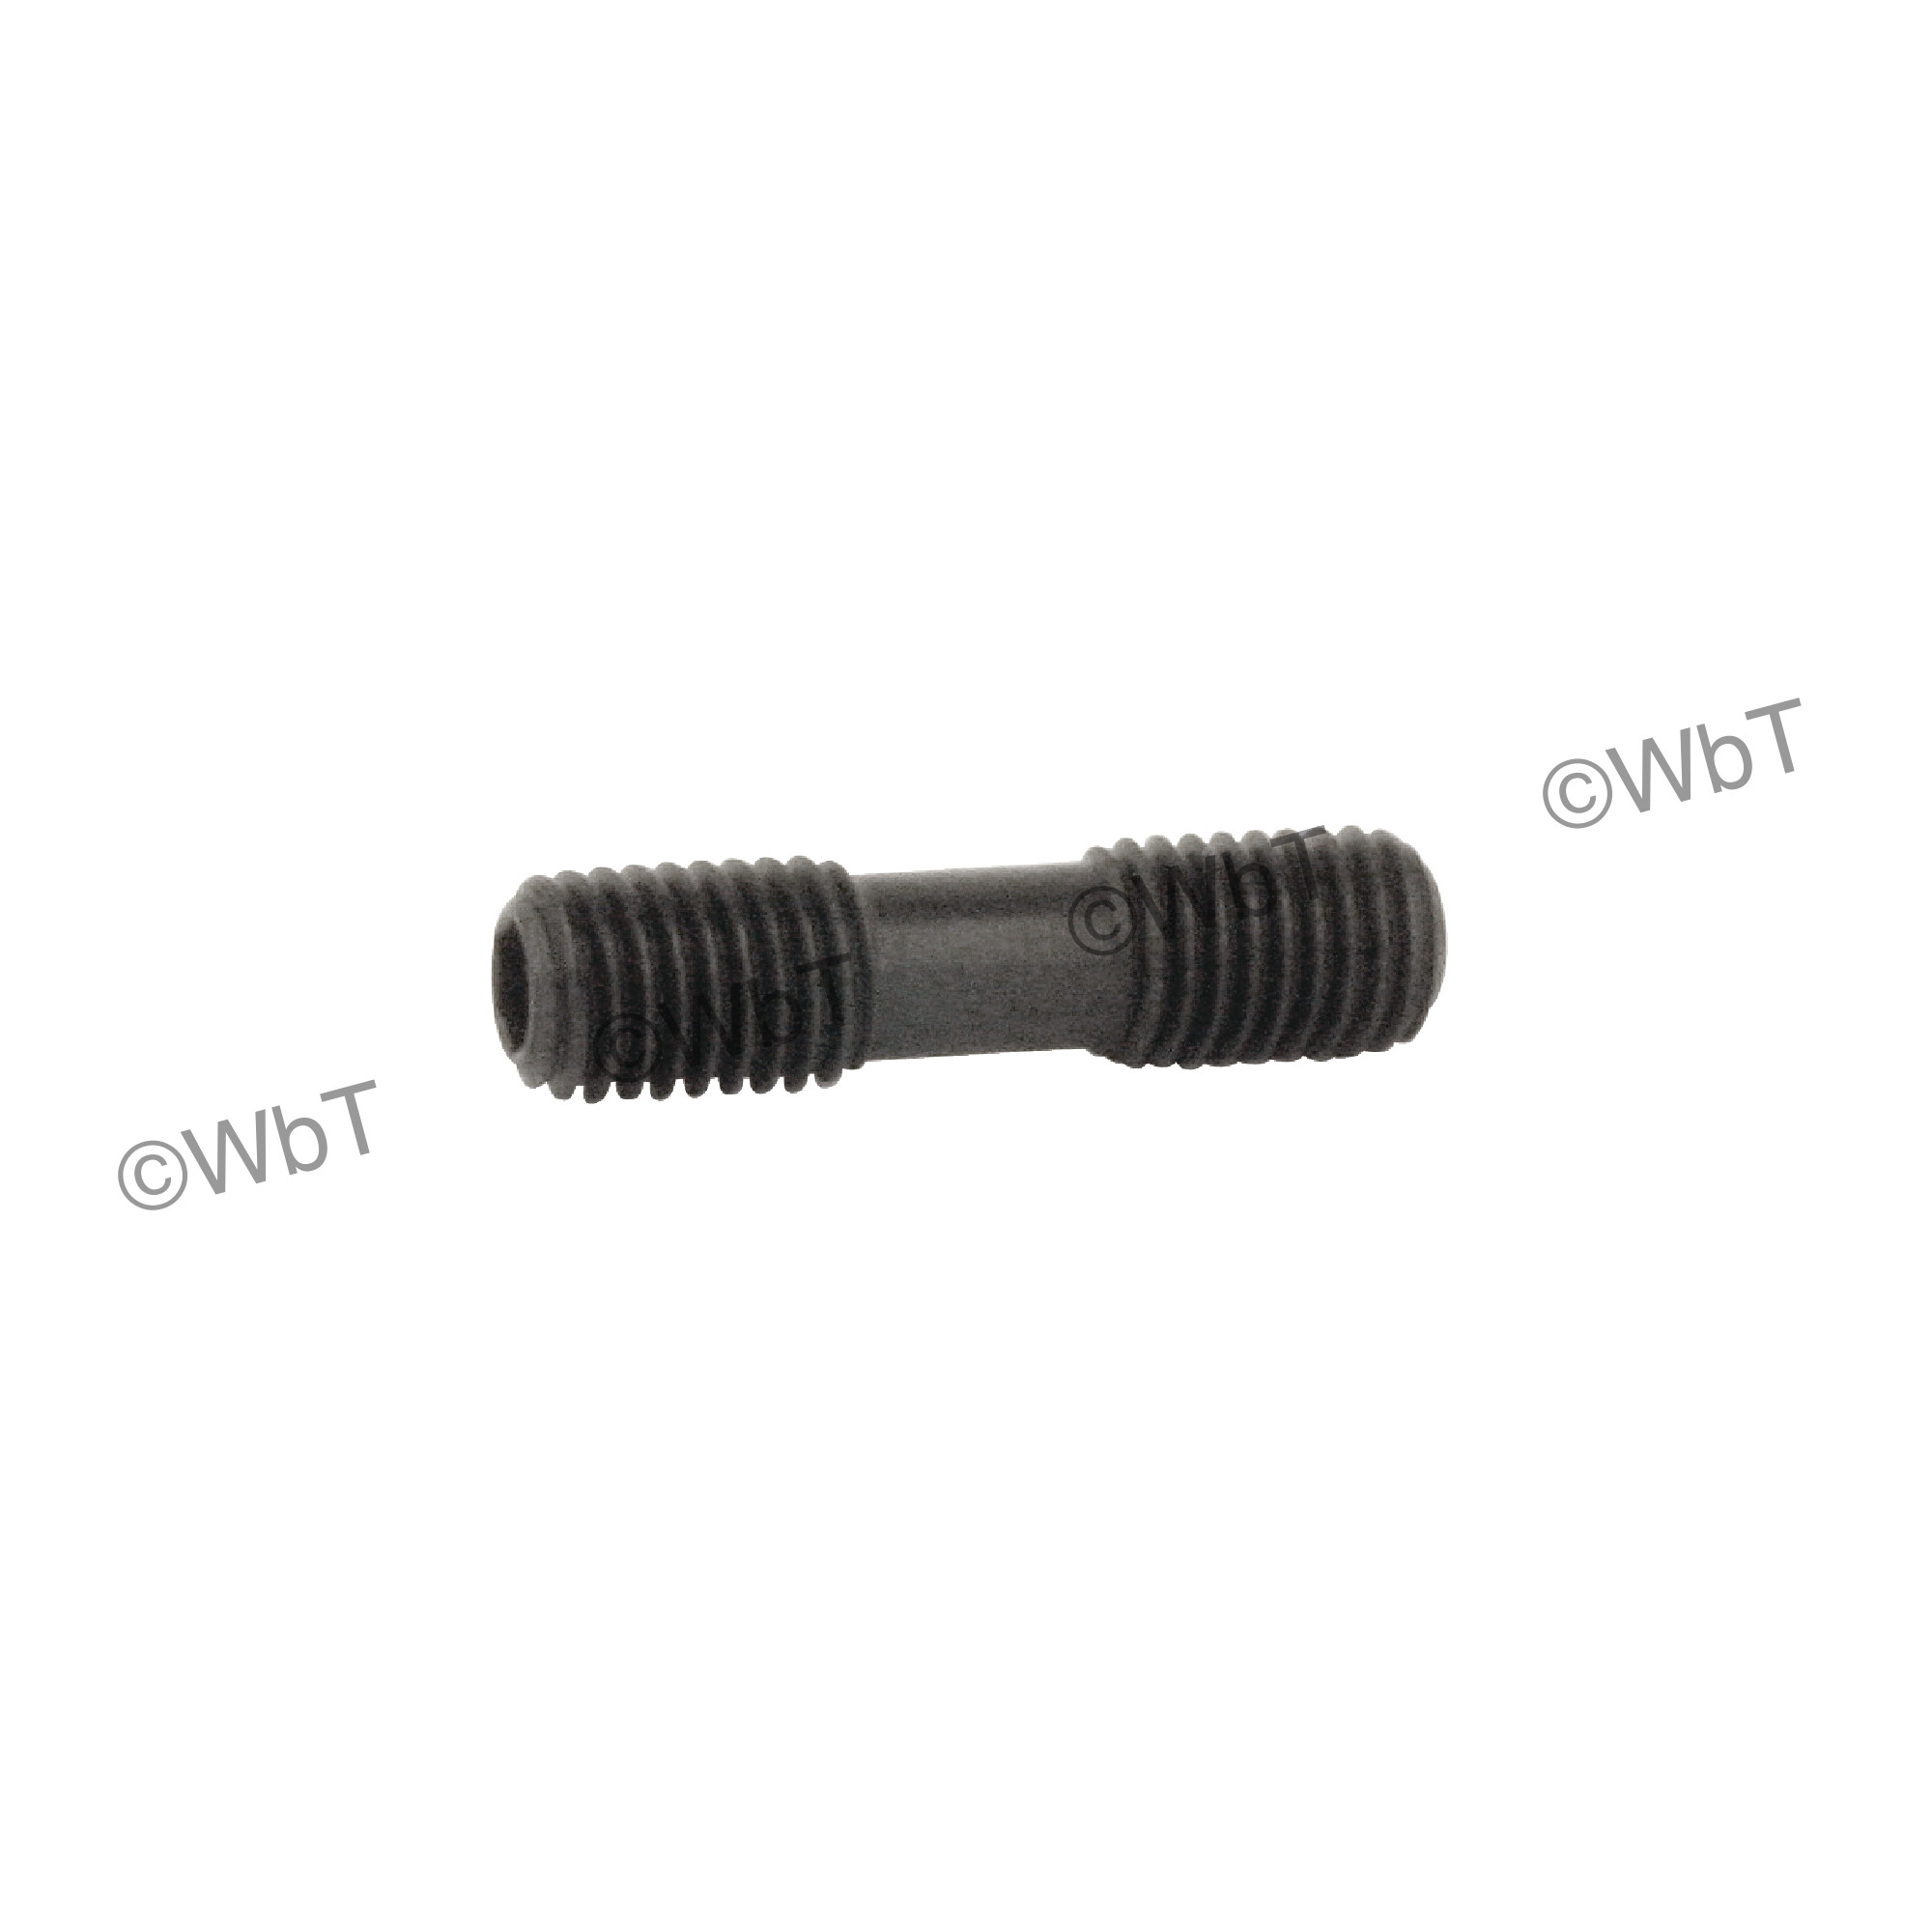 HW 1/8 Hex Key for MDJN Toolholder